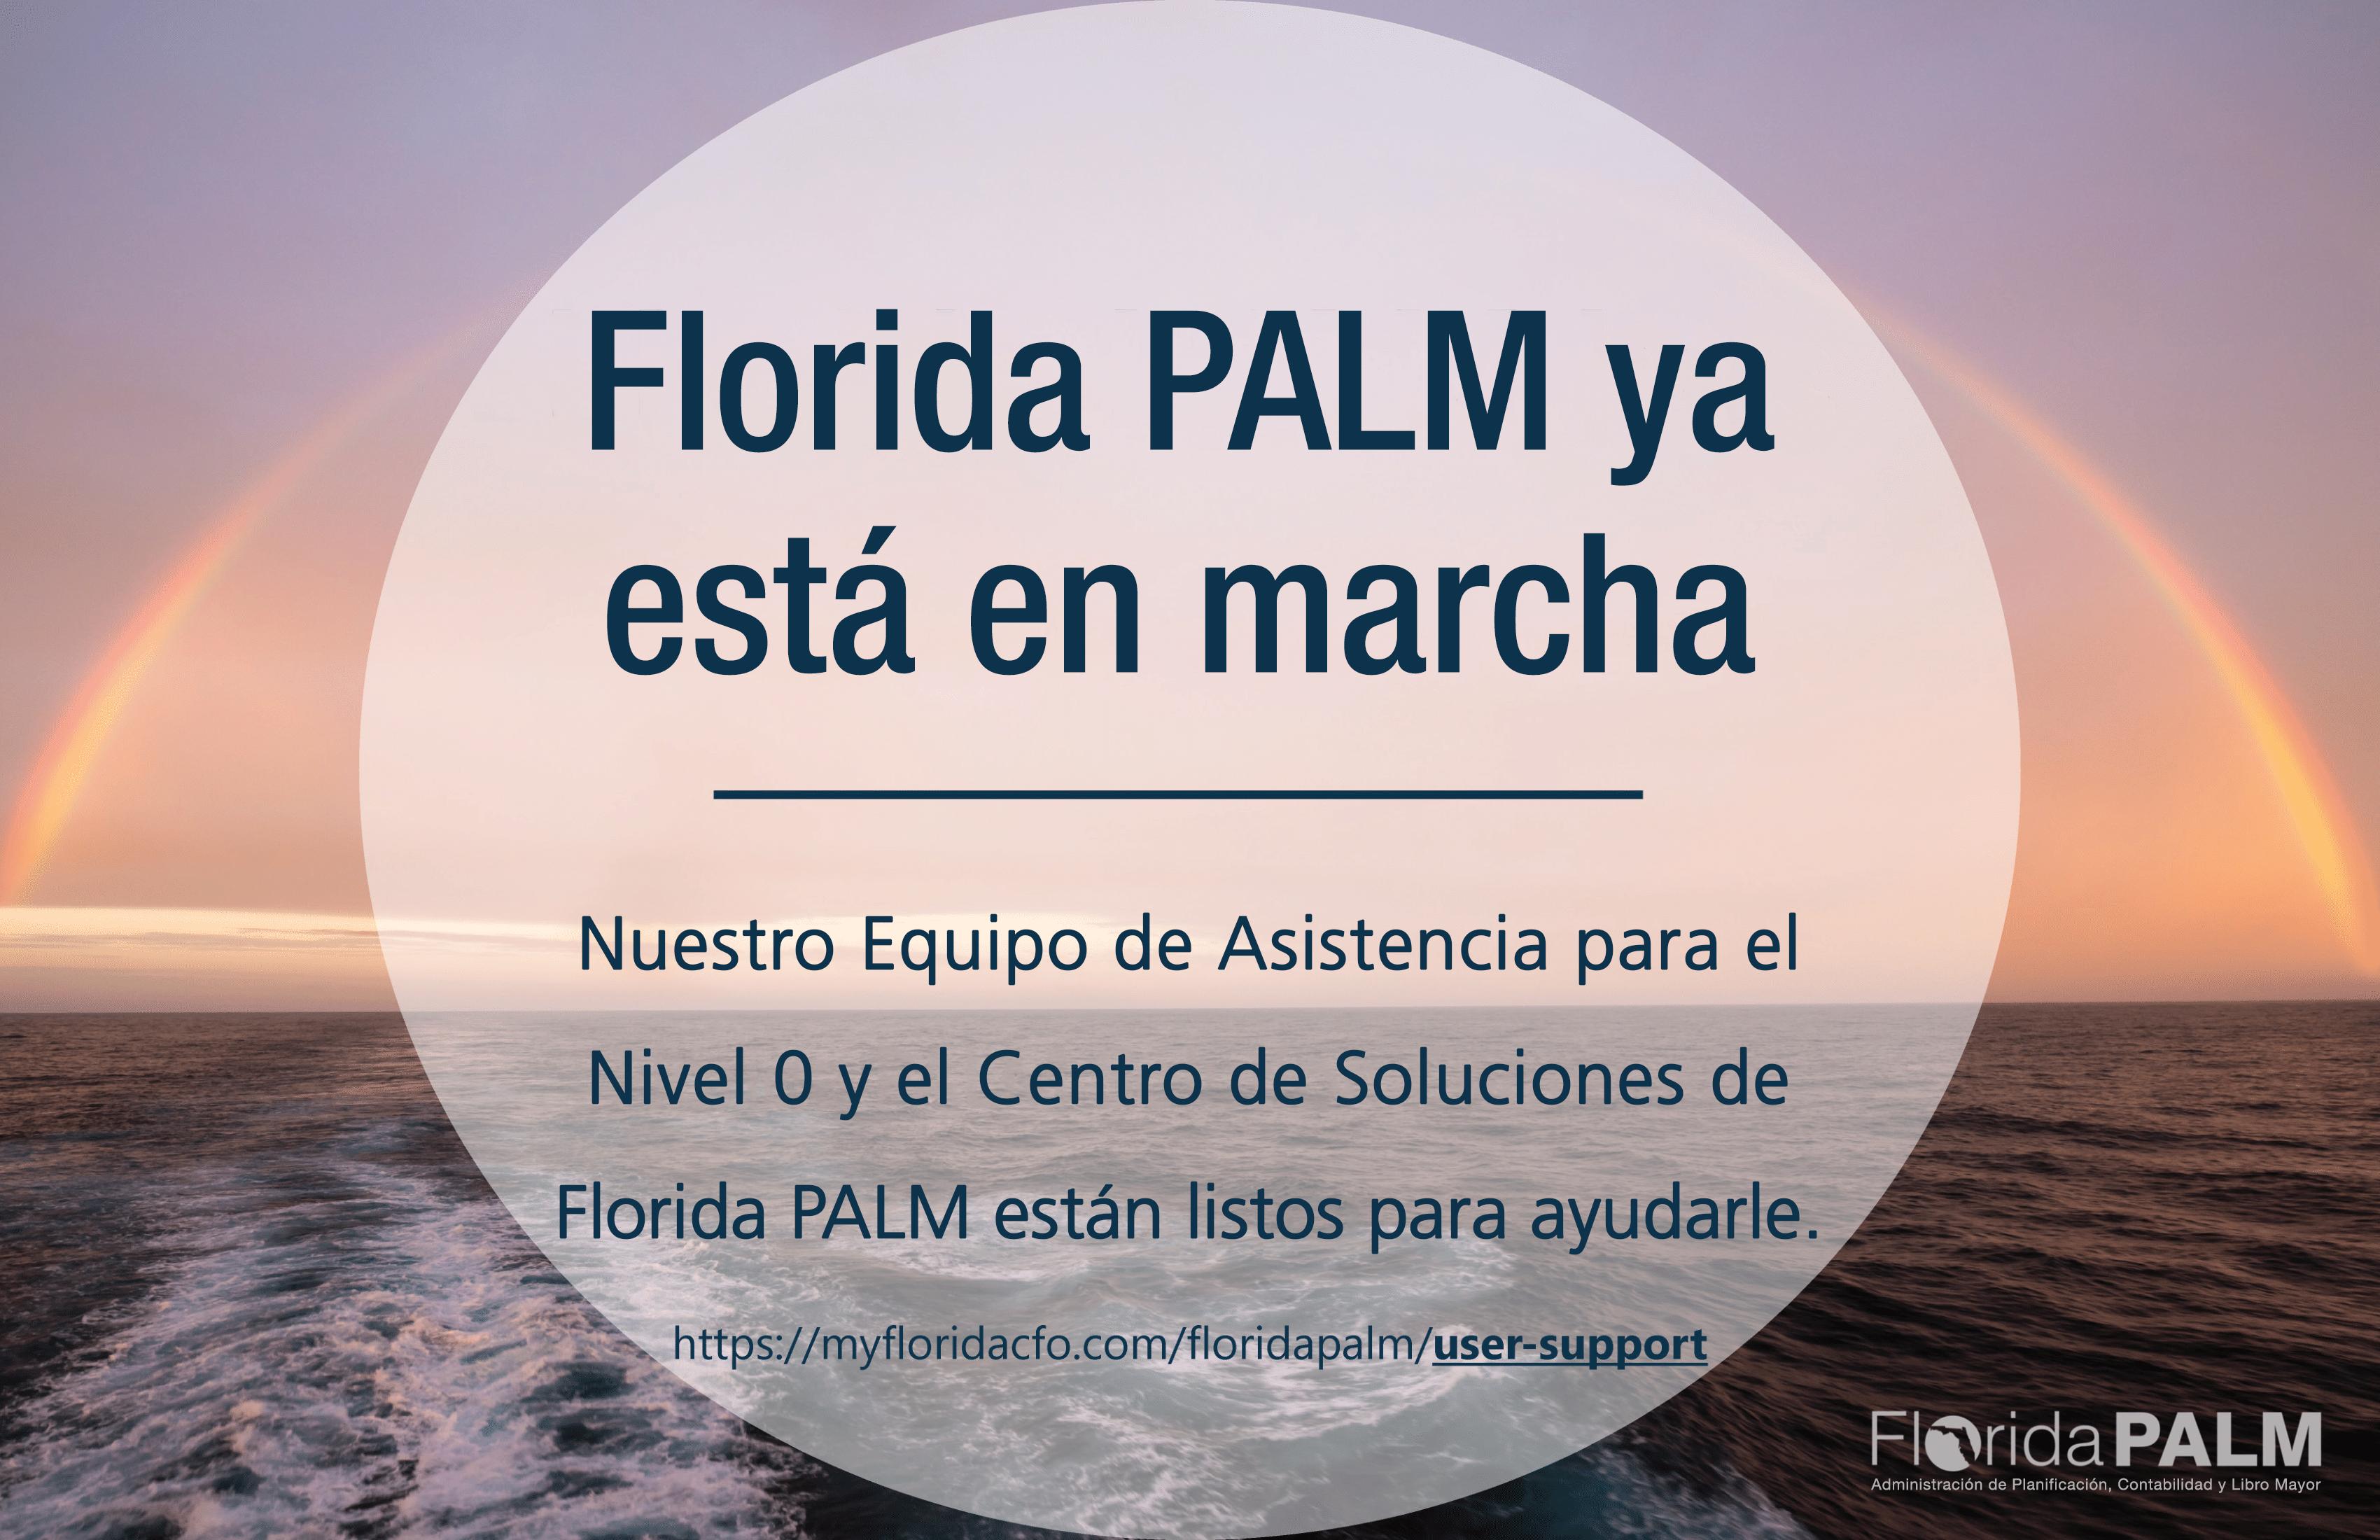 Florida PALM ya está en marcha